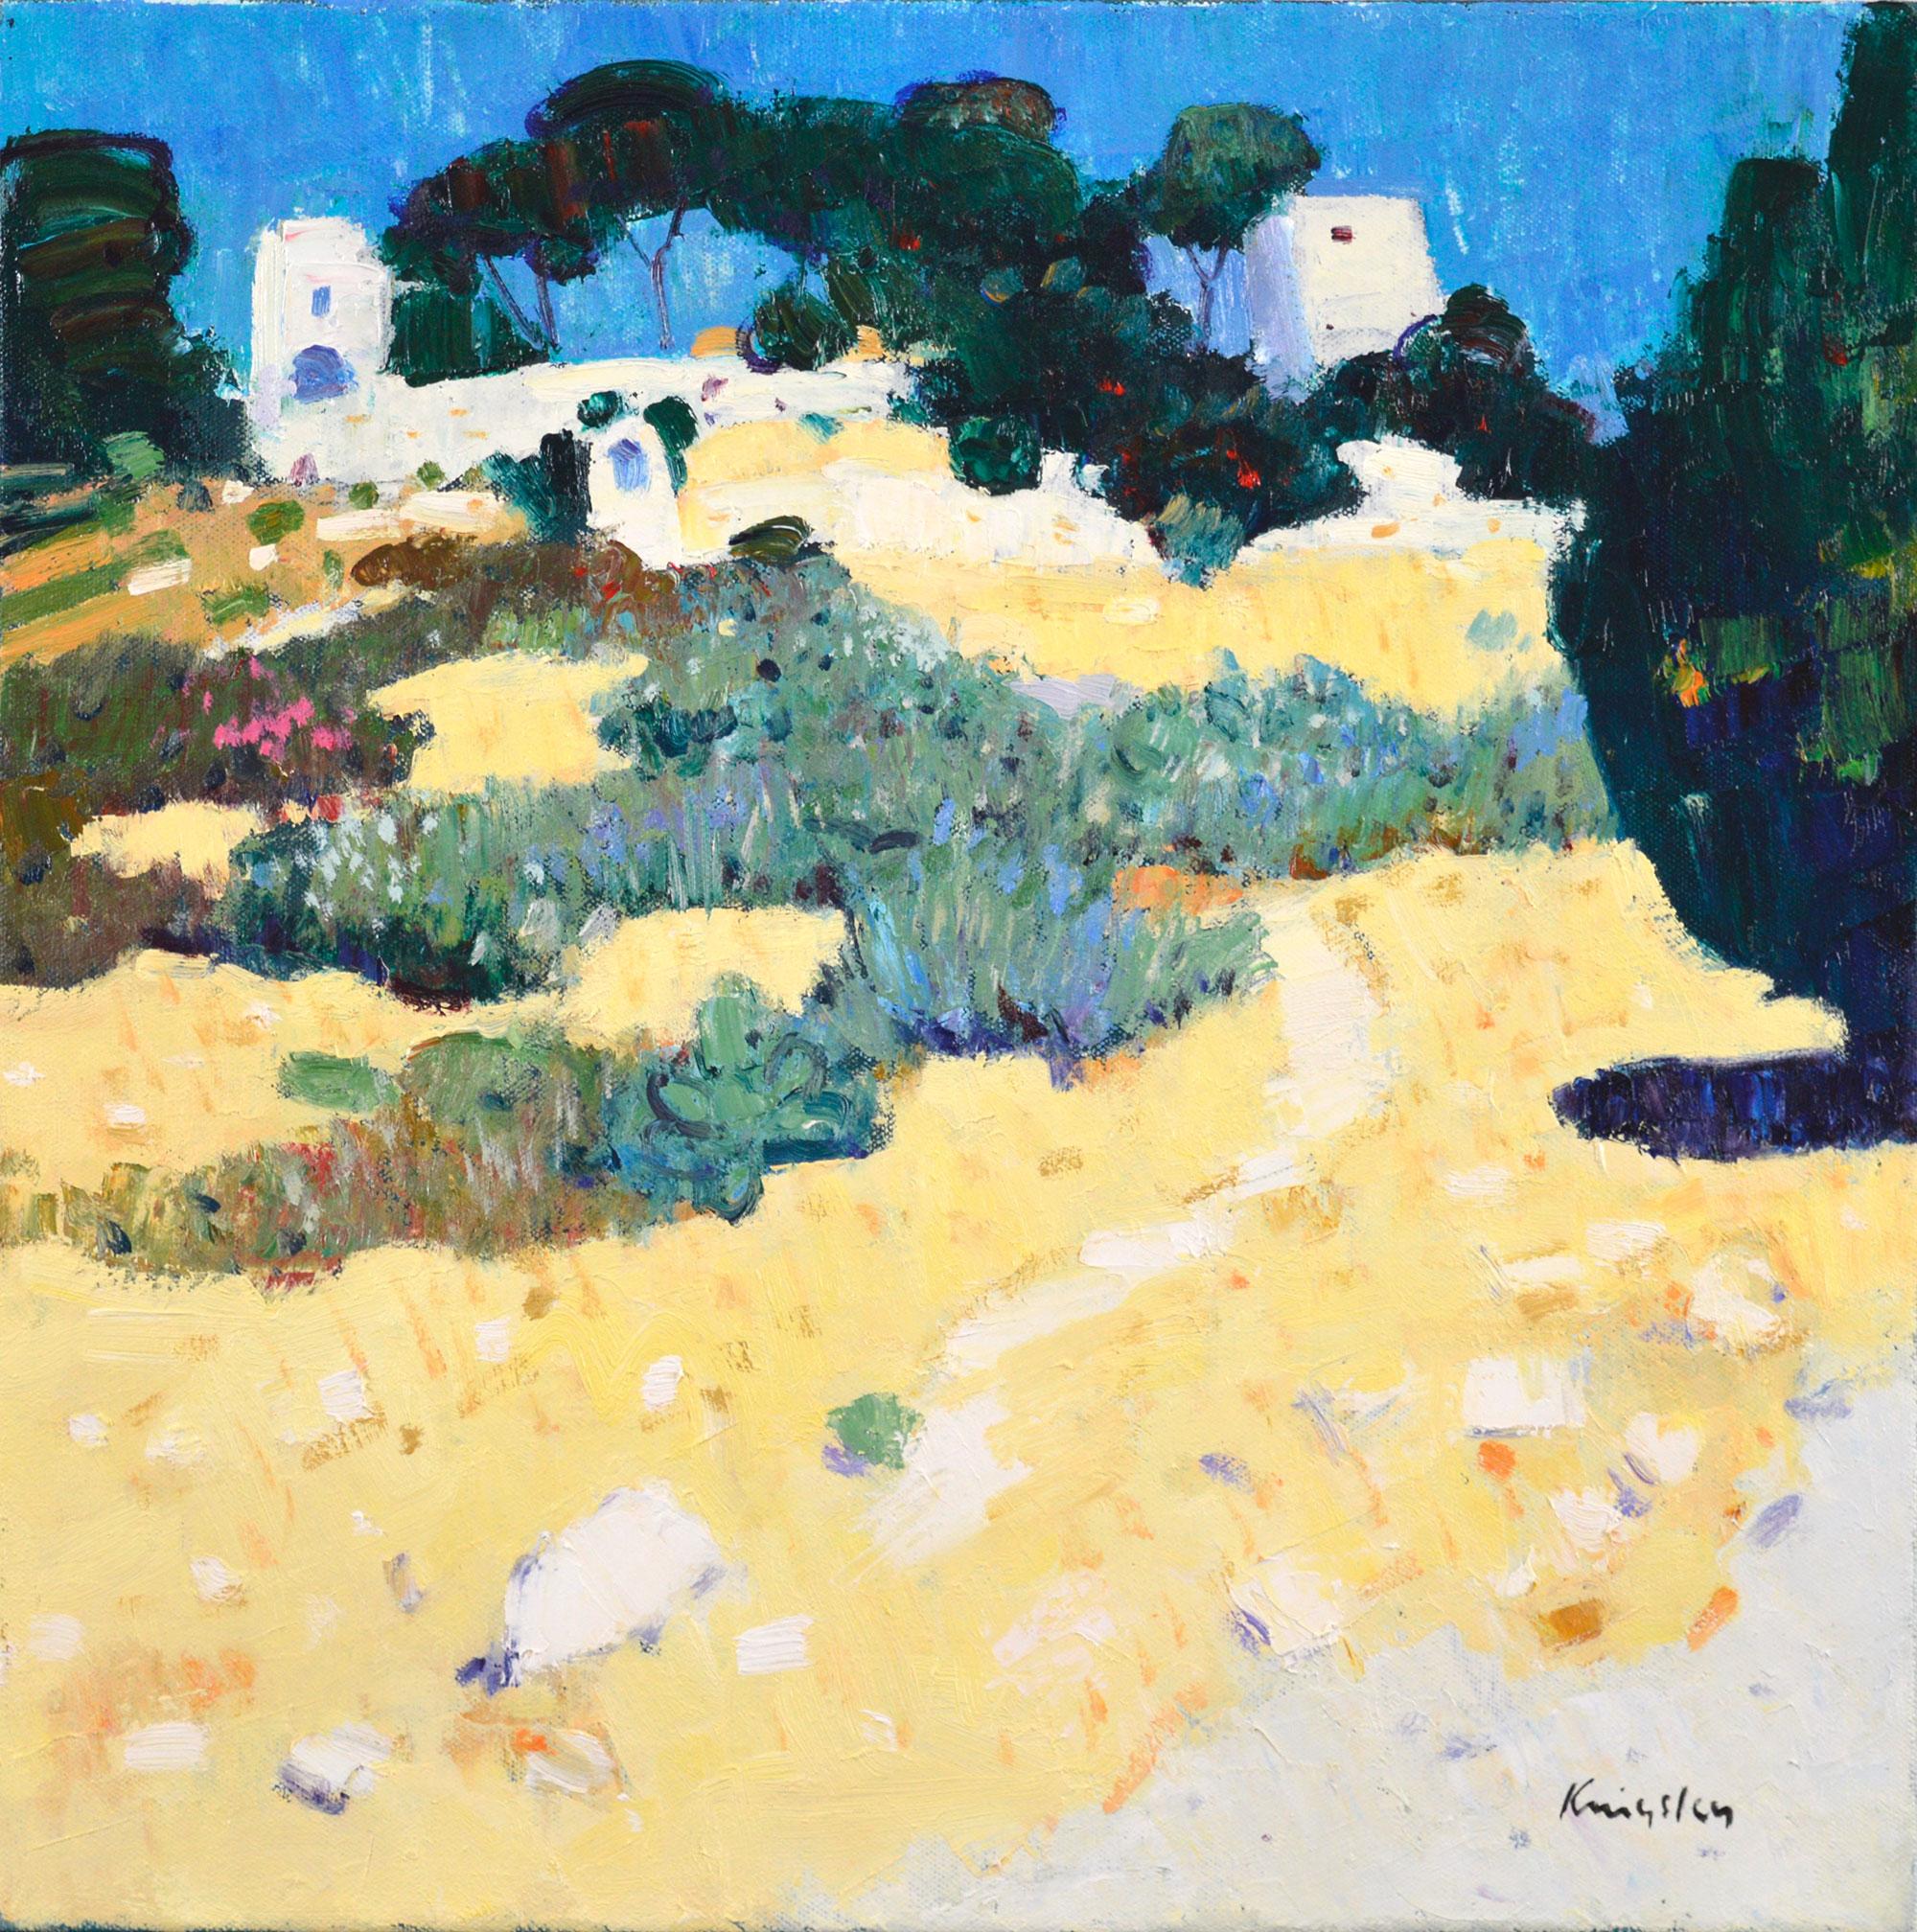 John  Kingsley Landscape at Daudet's Mill